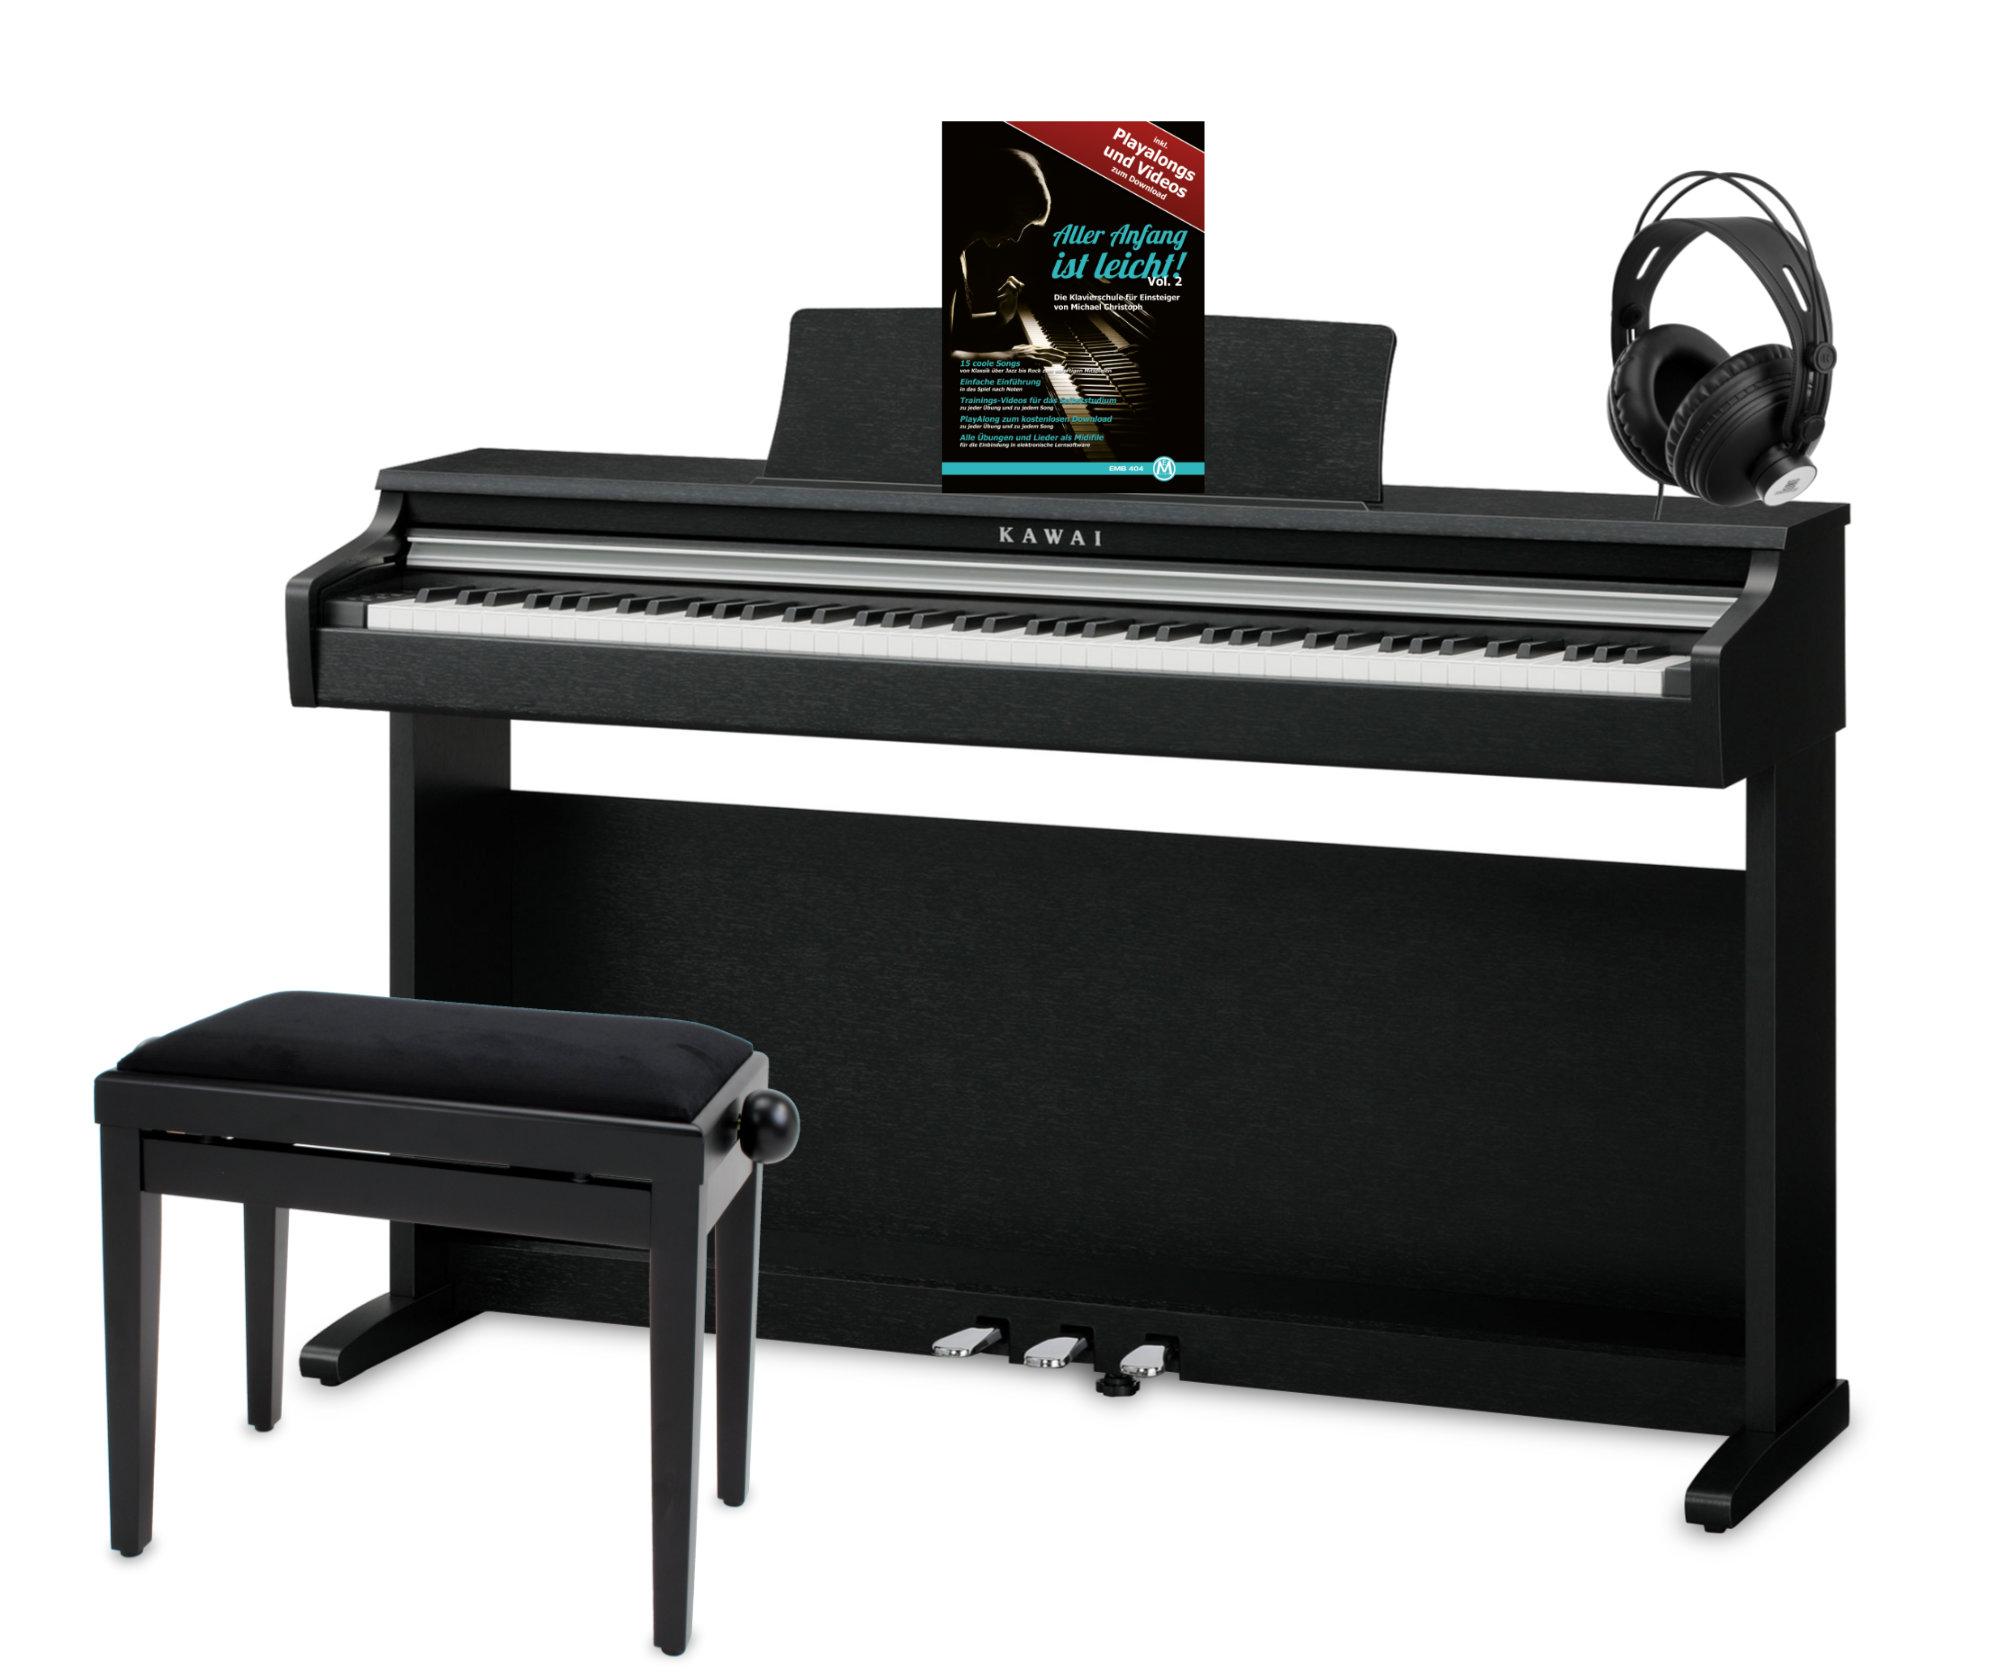 Kawai CN17 Digitalpiano Set inkl. Pianobank, Kopfhörer Klavierschule